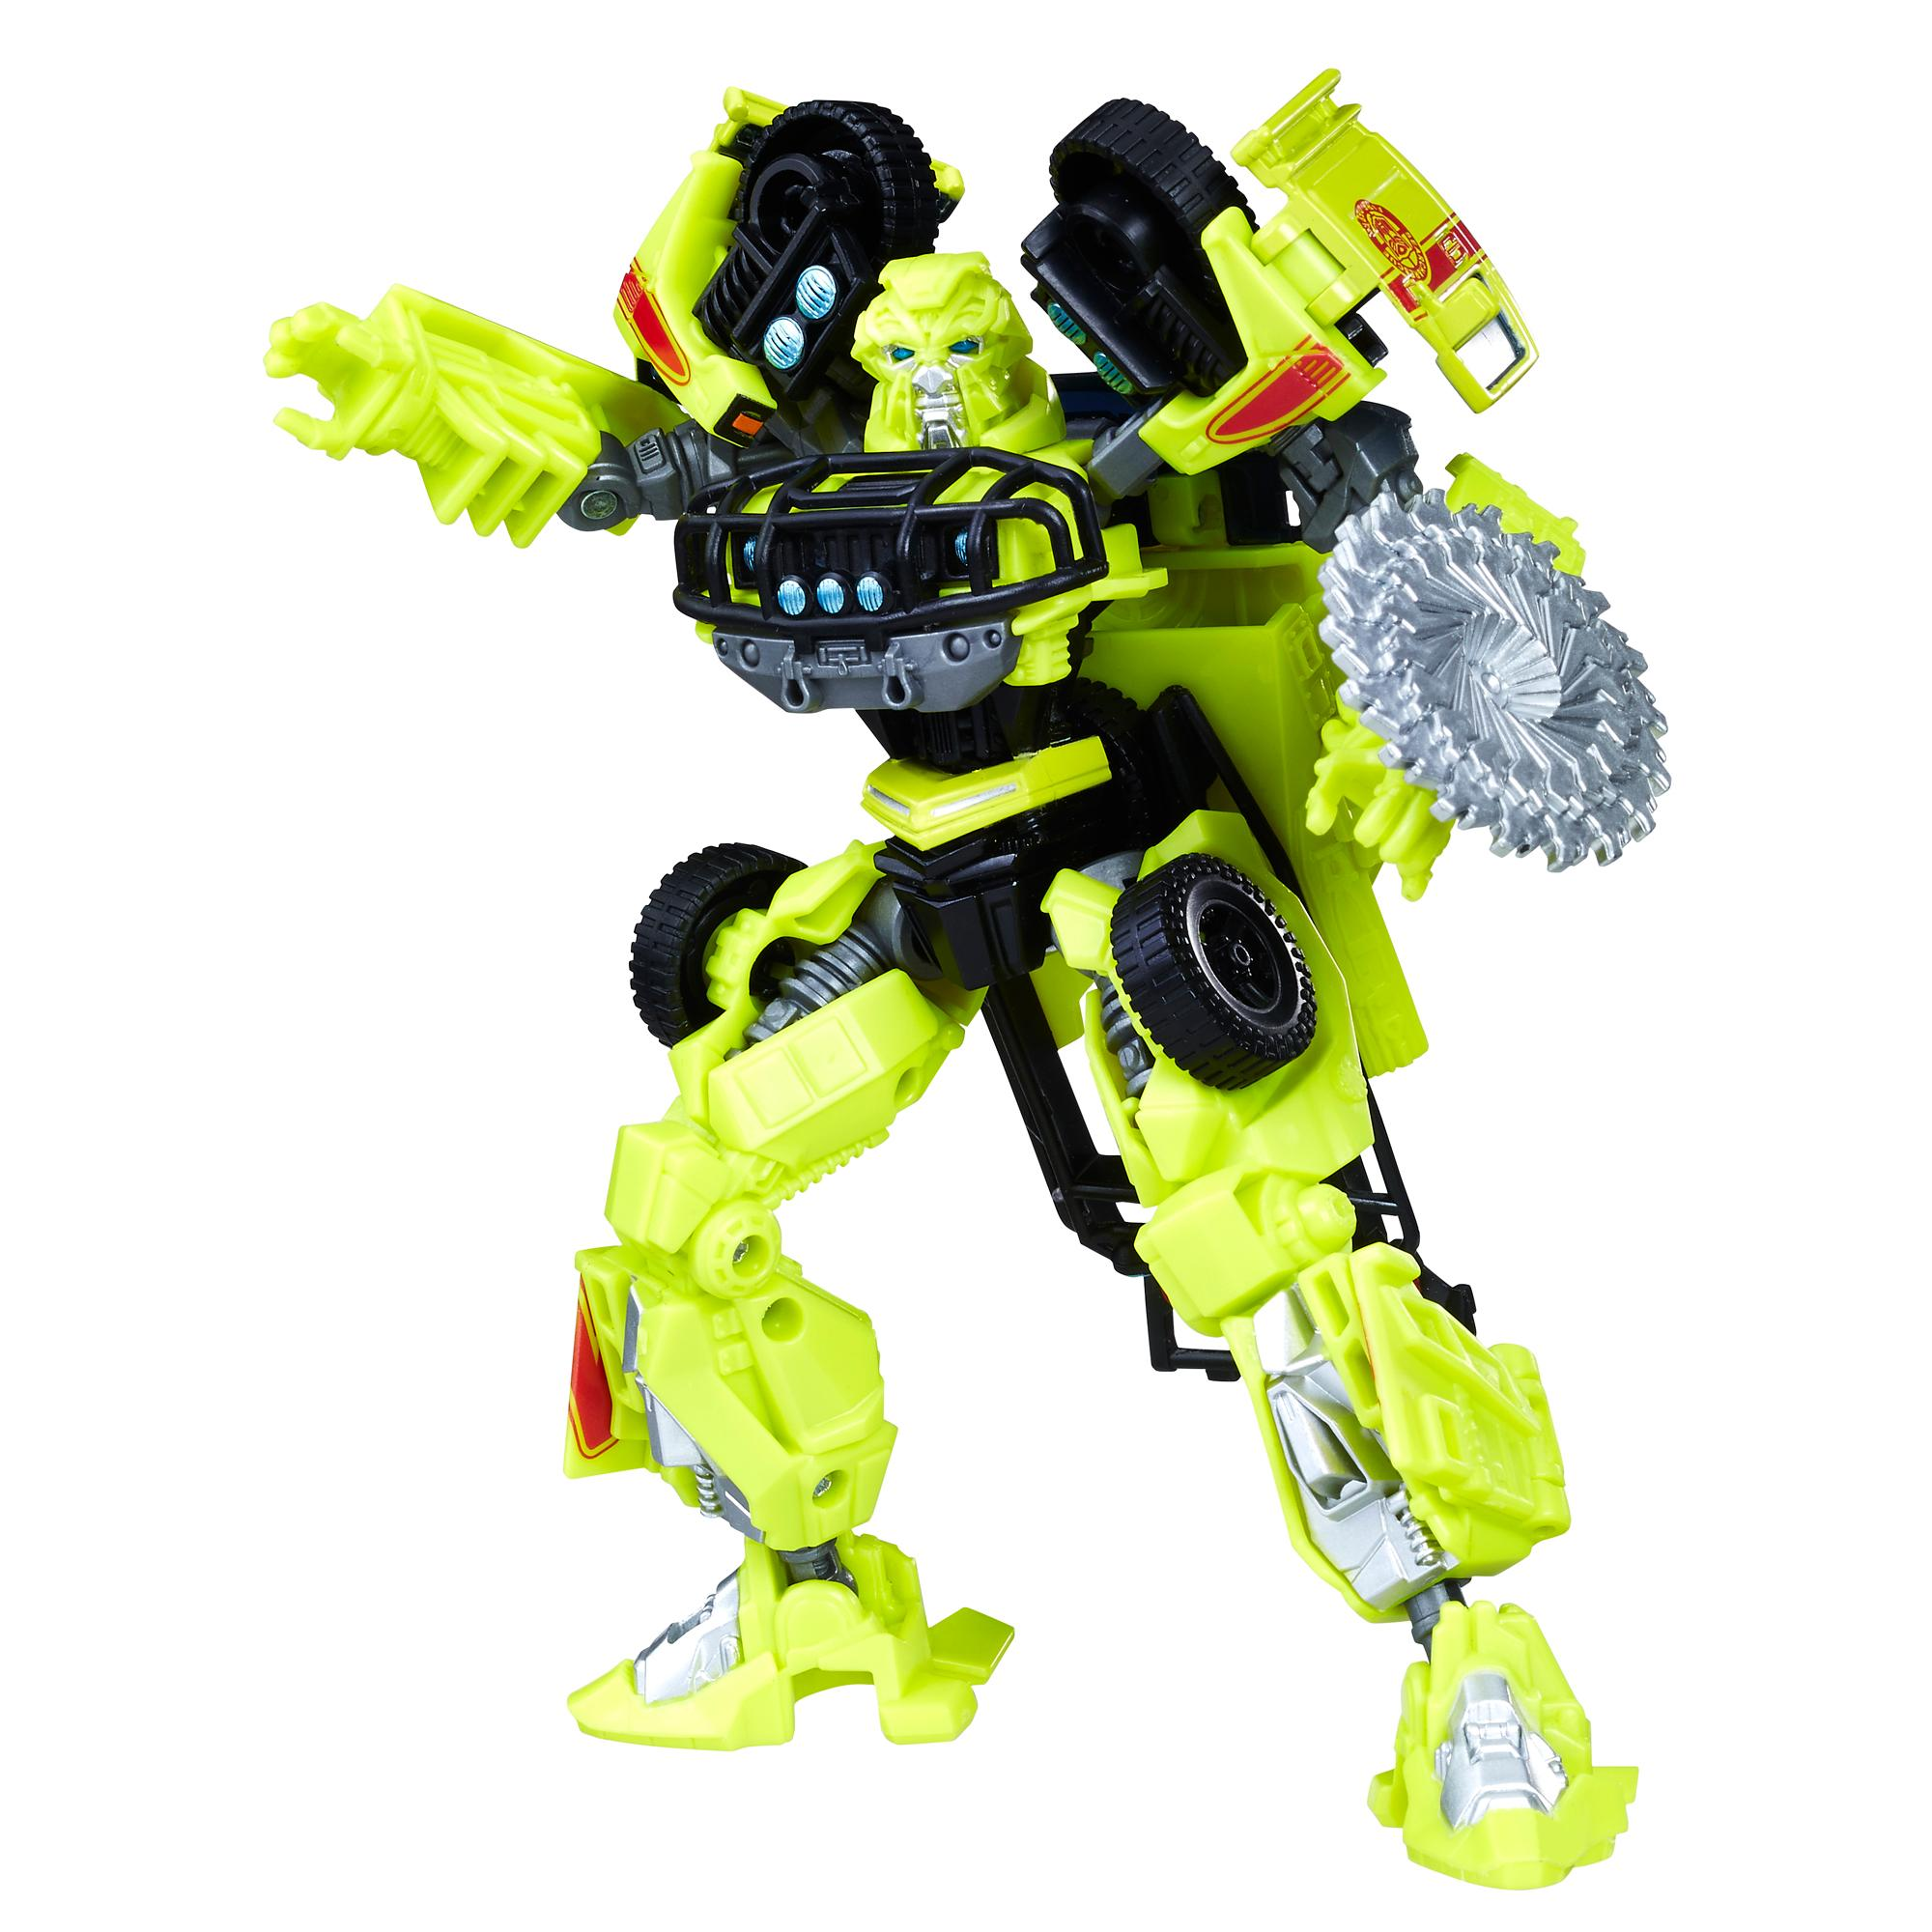 Transformers Estudio Series 04, clase de lujo, Película 1 Autobot Ratchet